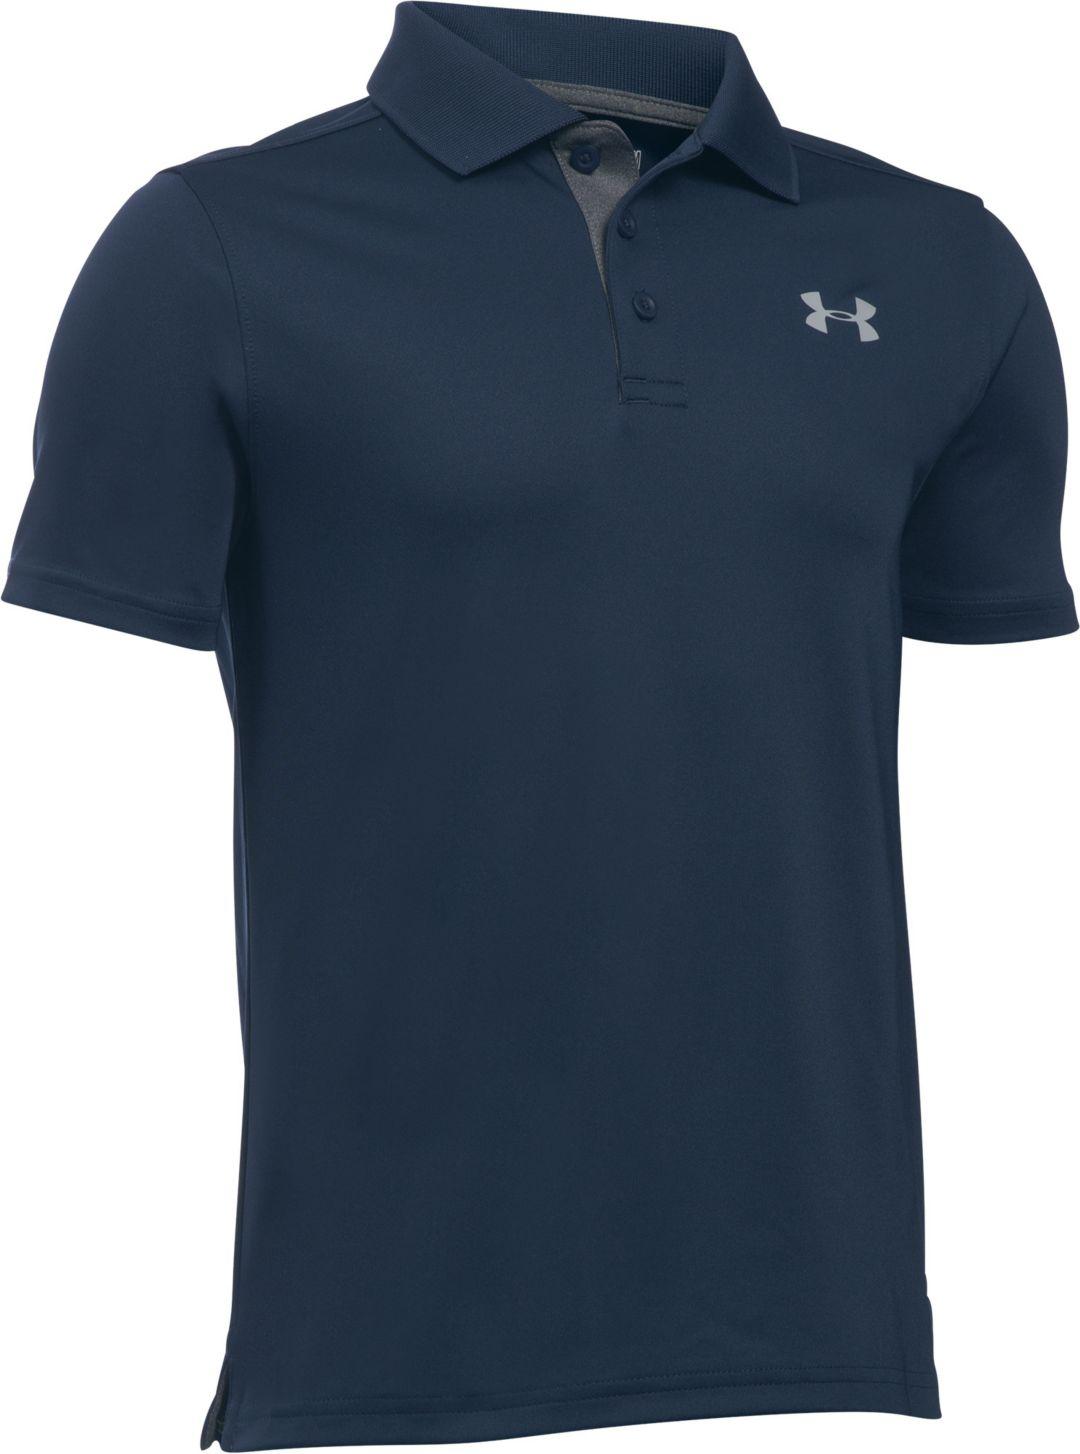 latest style cheaper sale best service Under Armour Boys' Performance Golf Polo